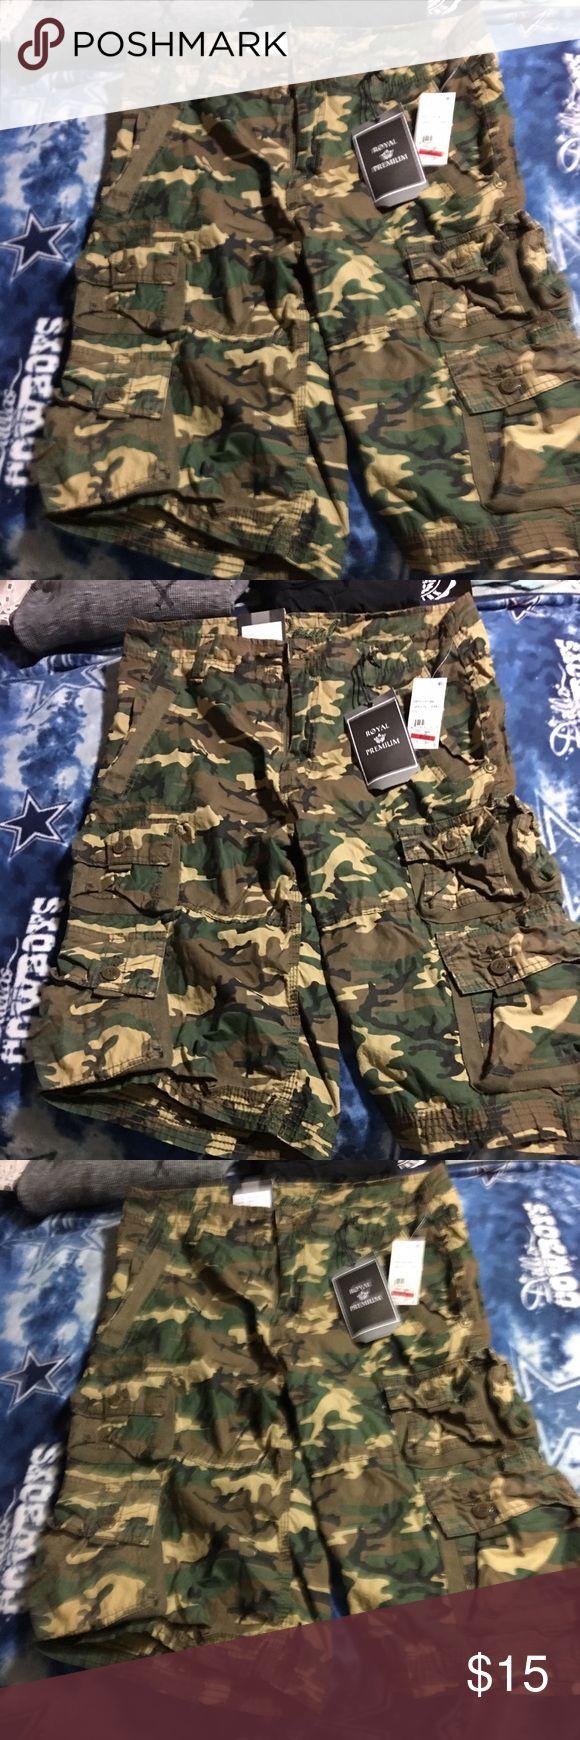 Men's camo shorts NWT camo shorts green.Made like cargo shorts. Shorts Cargo